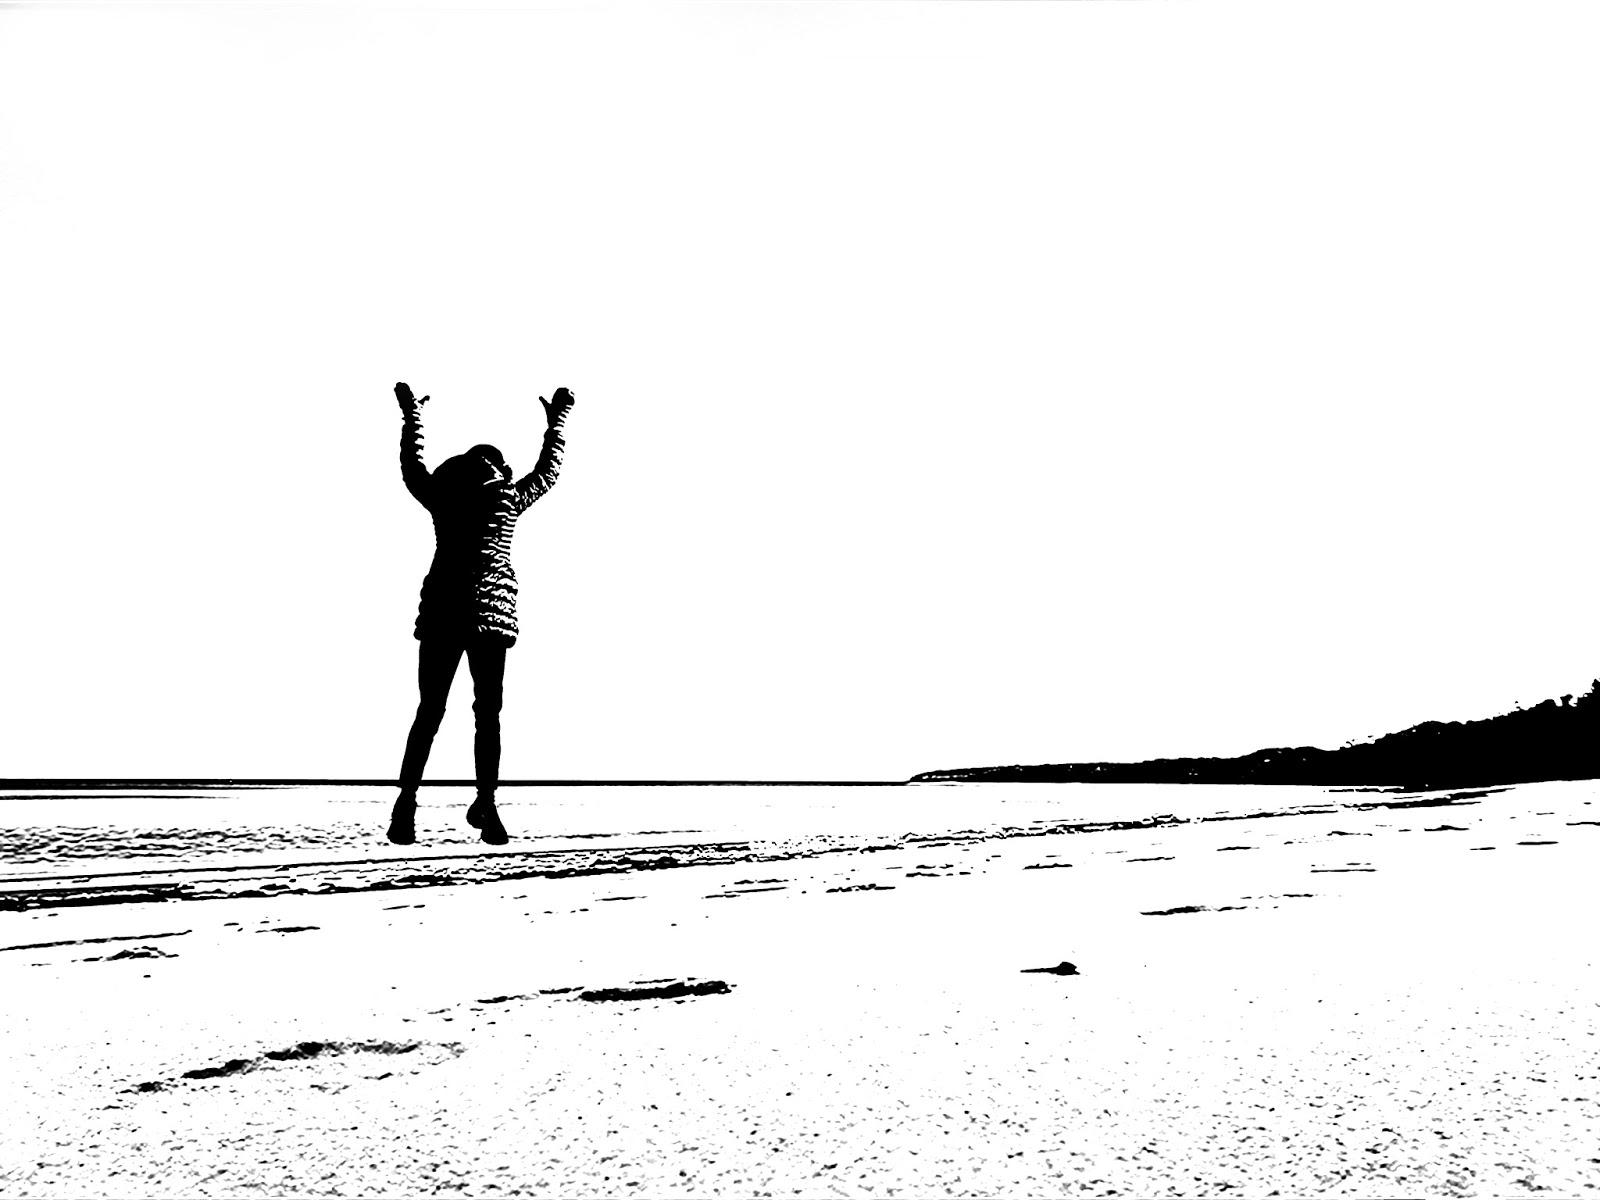 Joe's Retirement Blog: A Zero Gravity Day, Manomet